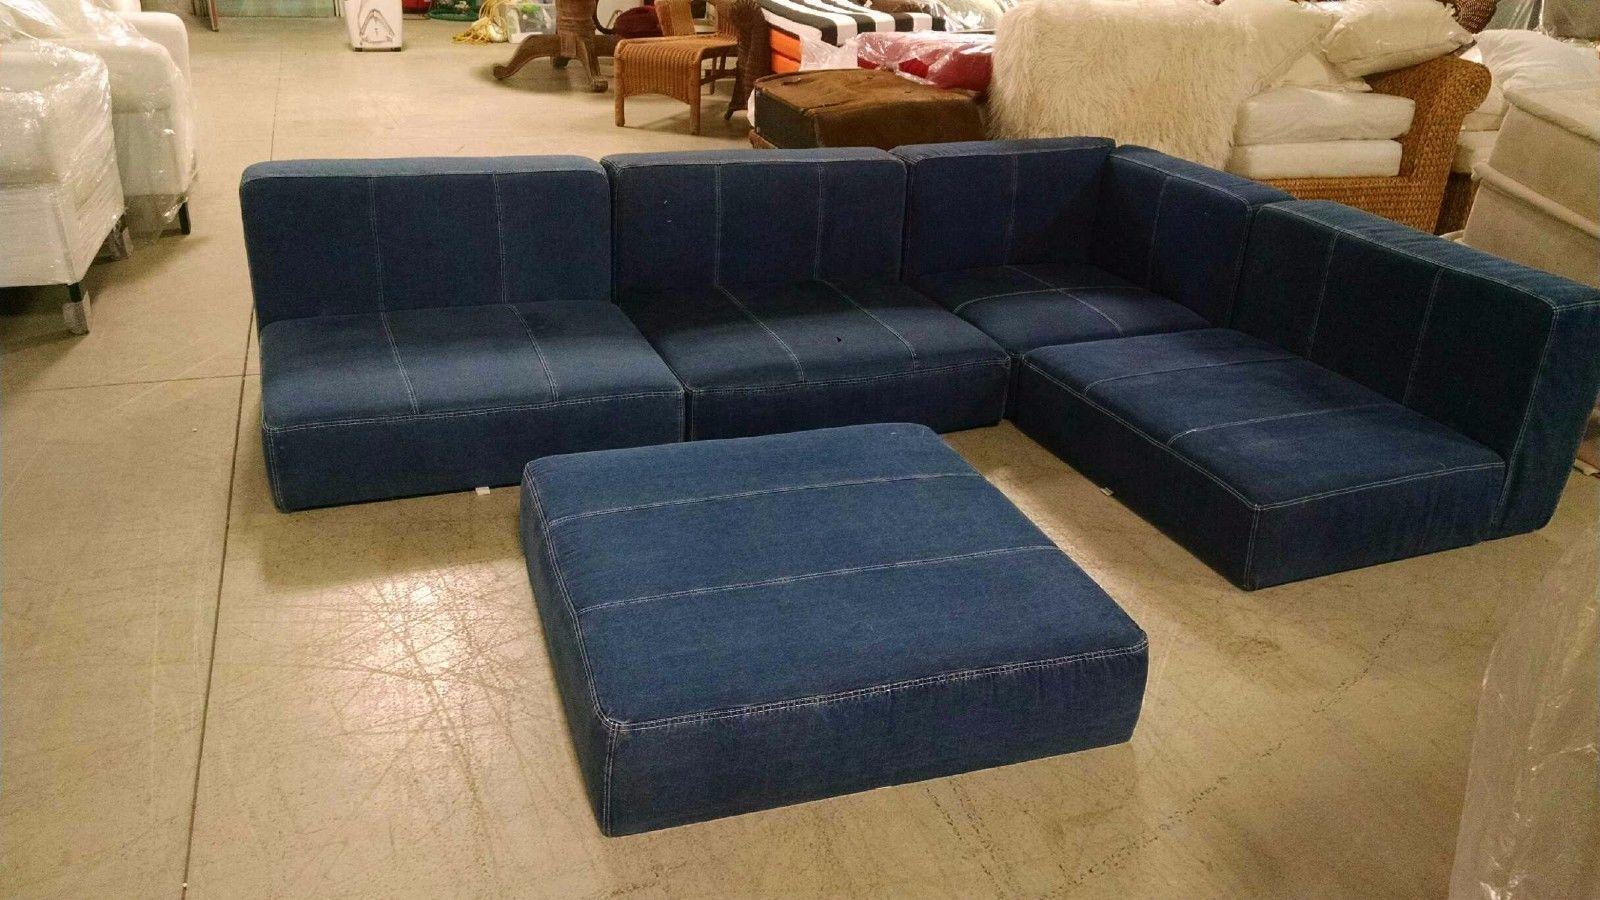 Pottery Barn Sleeper Sofa Ebay And Couch Sale 5 Pc Teen Cushy Lounge Floor Corner Chair Ottoman Denim